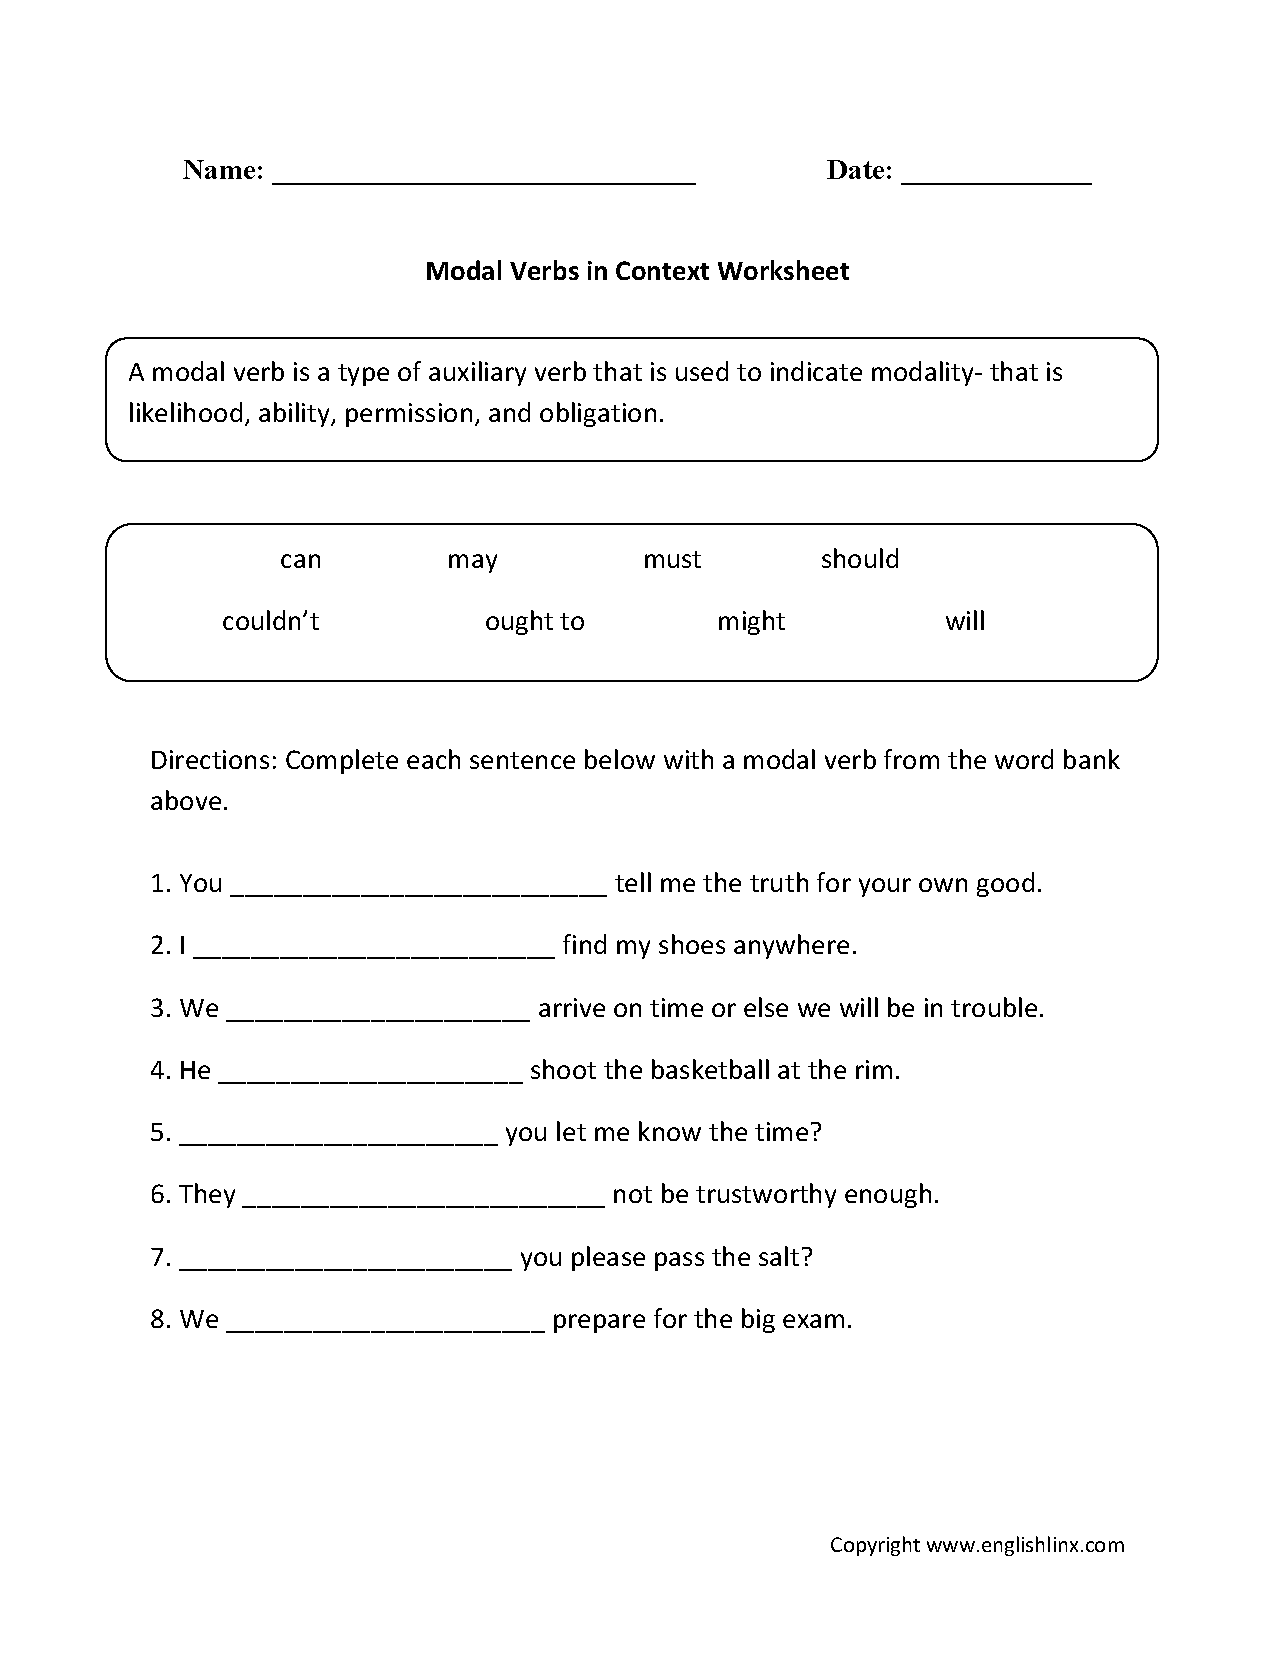 modal verbs worksheets board verb worksheets grammar lessons teaching grammar. Black Bedroom Furniture Sets. Home Design Ideas